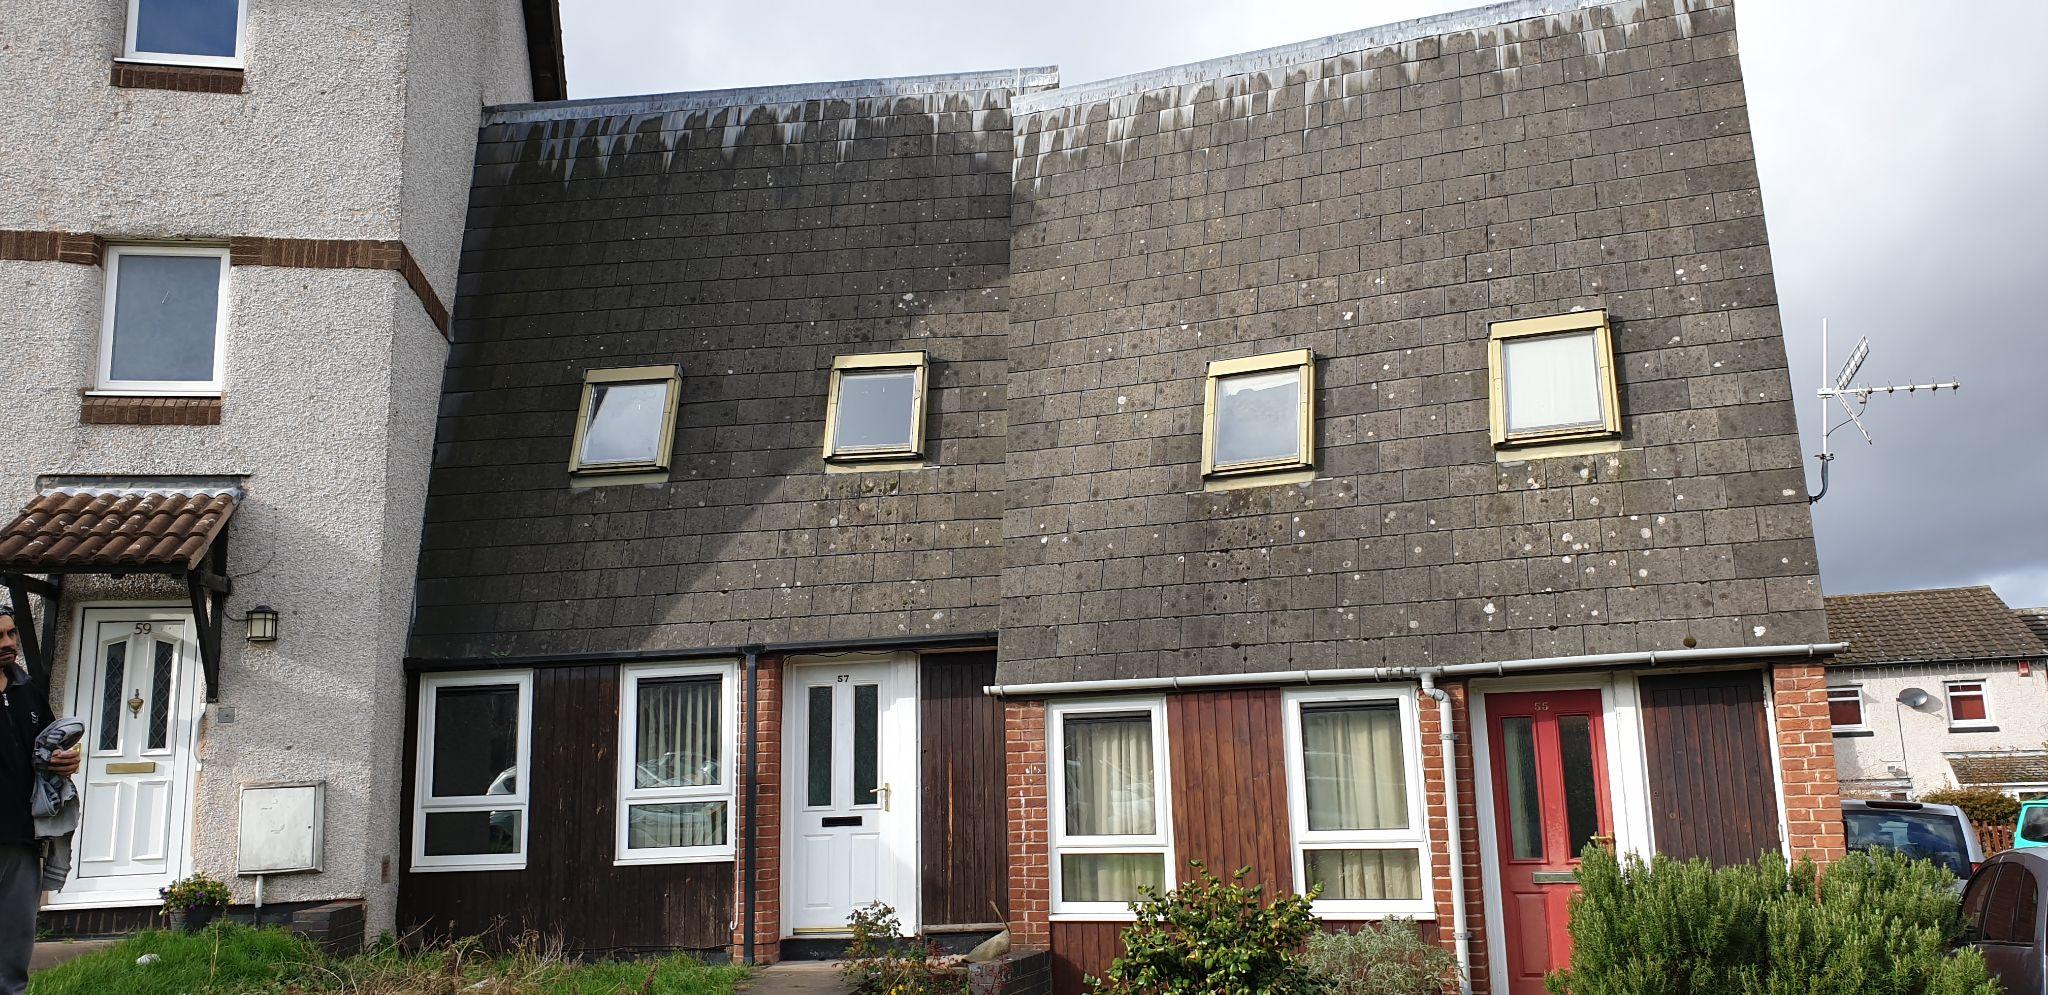 57 Balderstone Close, Leicester